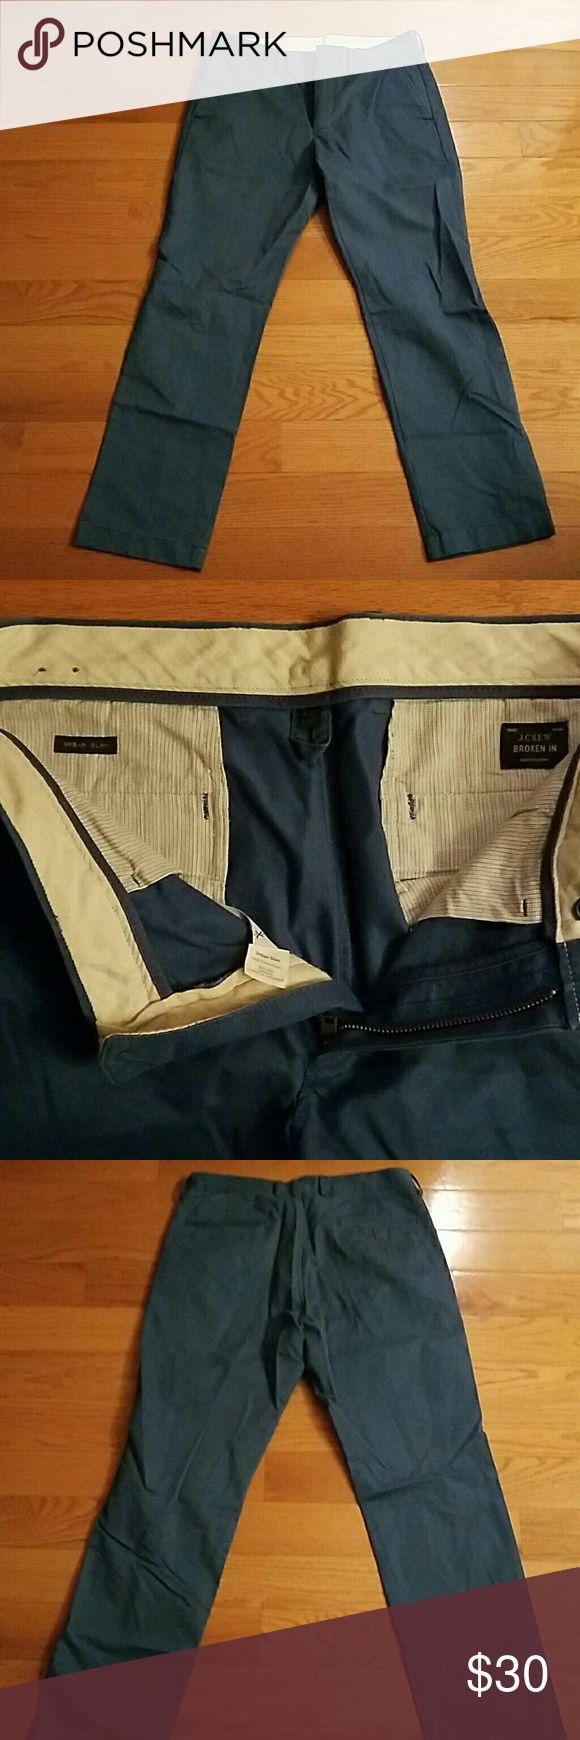 Blue J Crew Urban Slim Fit Chinos 31x30 Broken-in J Crew Chino pants. Great condition. J Crew  Pants Chinos & Khakis